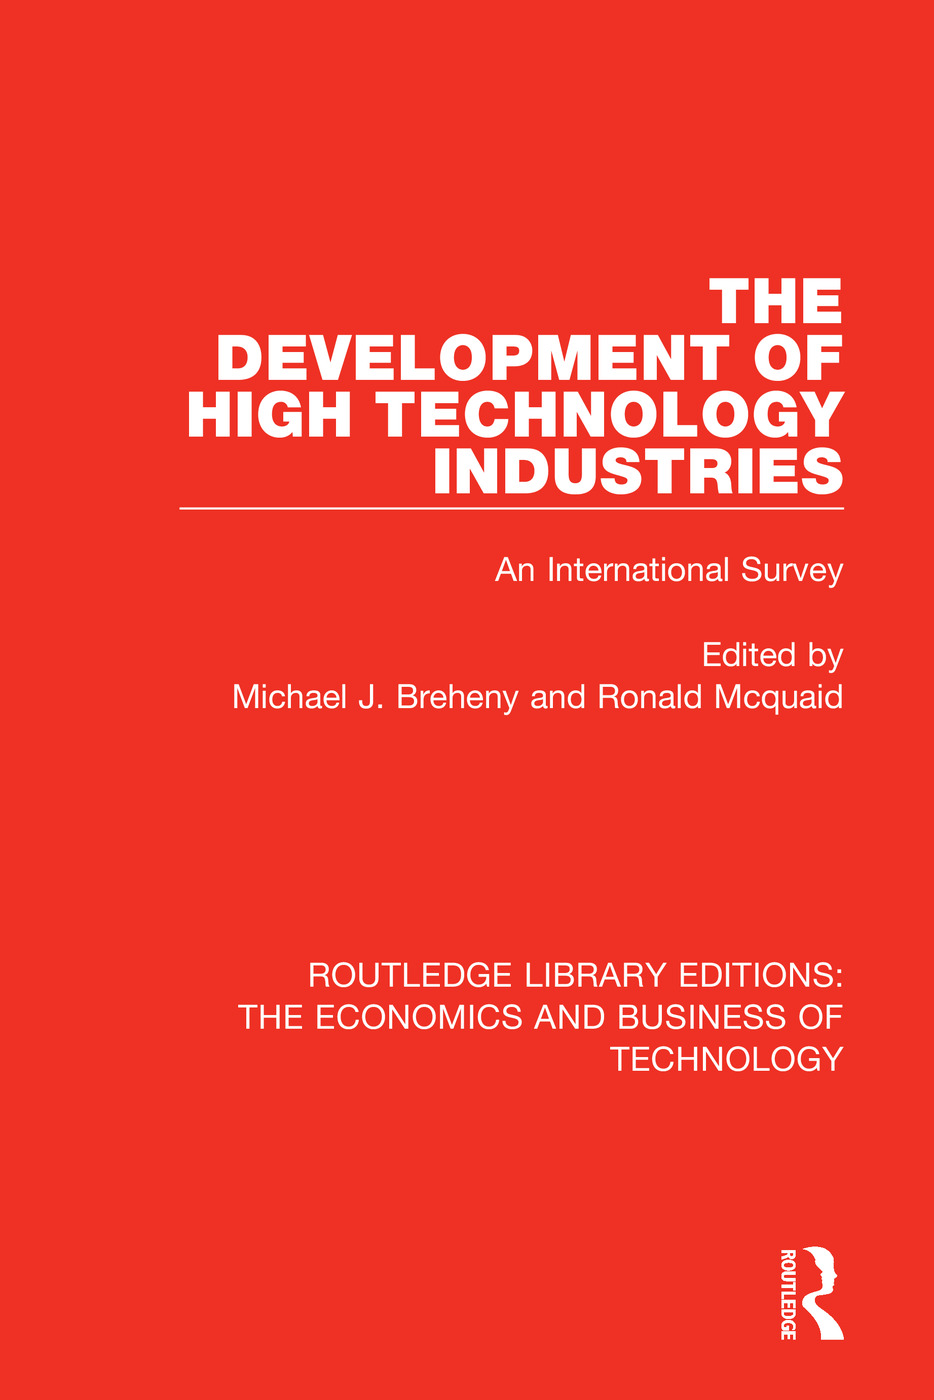 The Development of High Technology Industries: An International Survey book cover